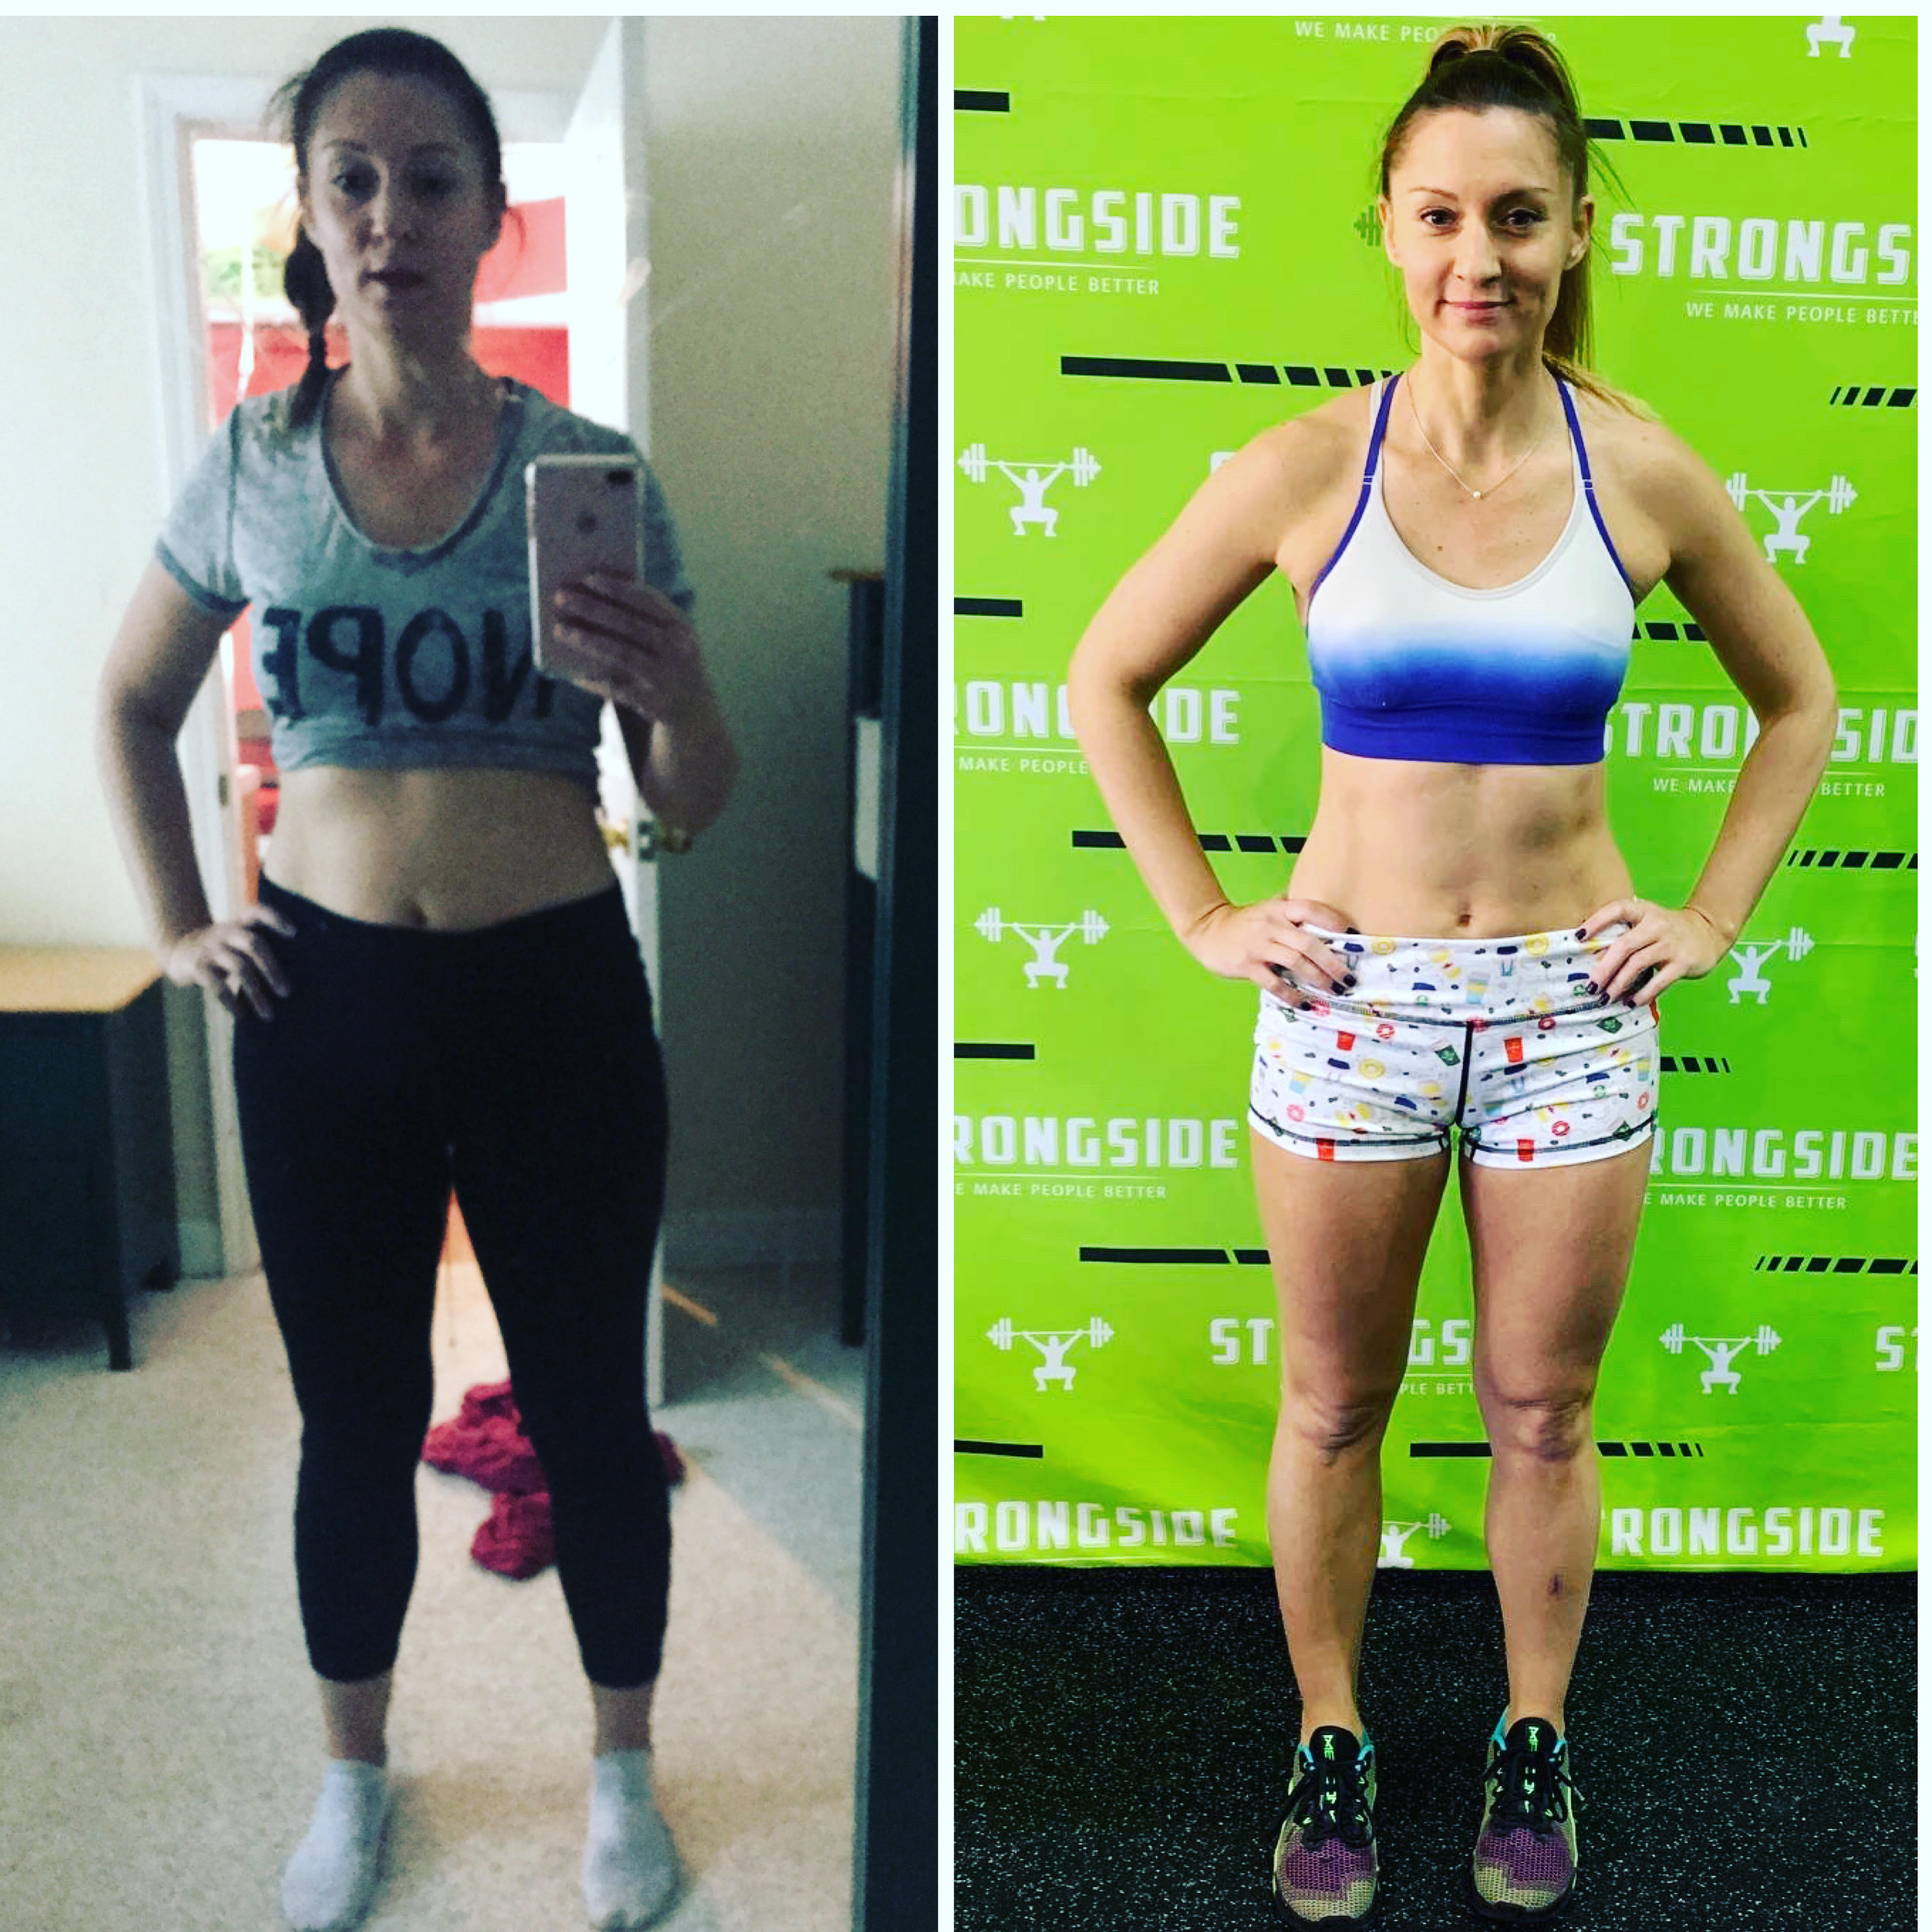 Emma Uvena shares her transformation in mind, body, and spirit